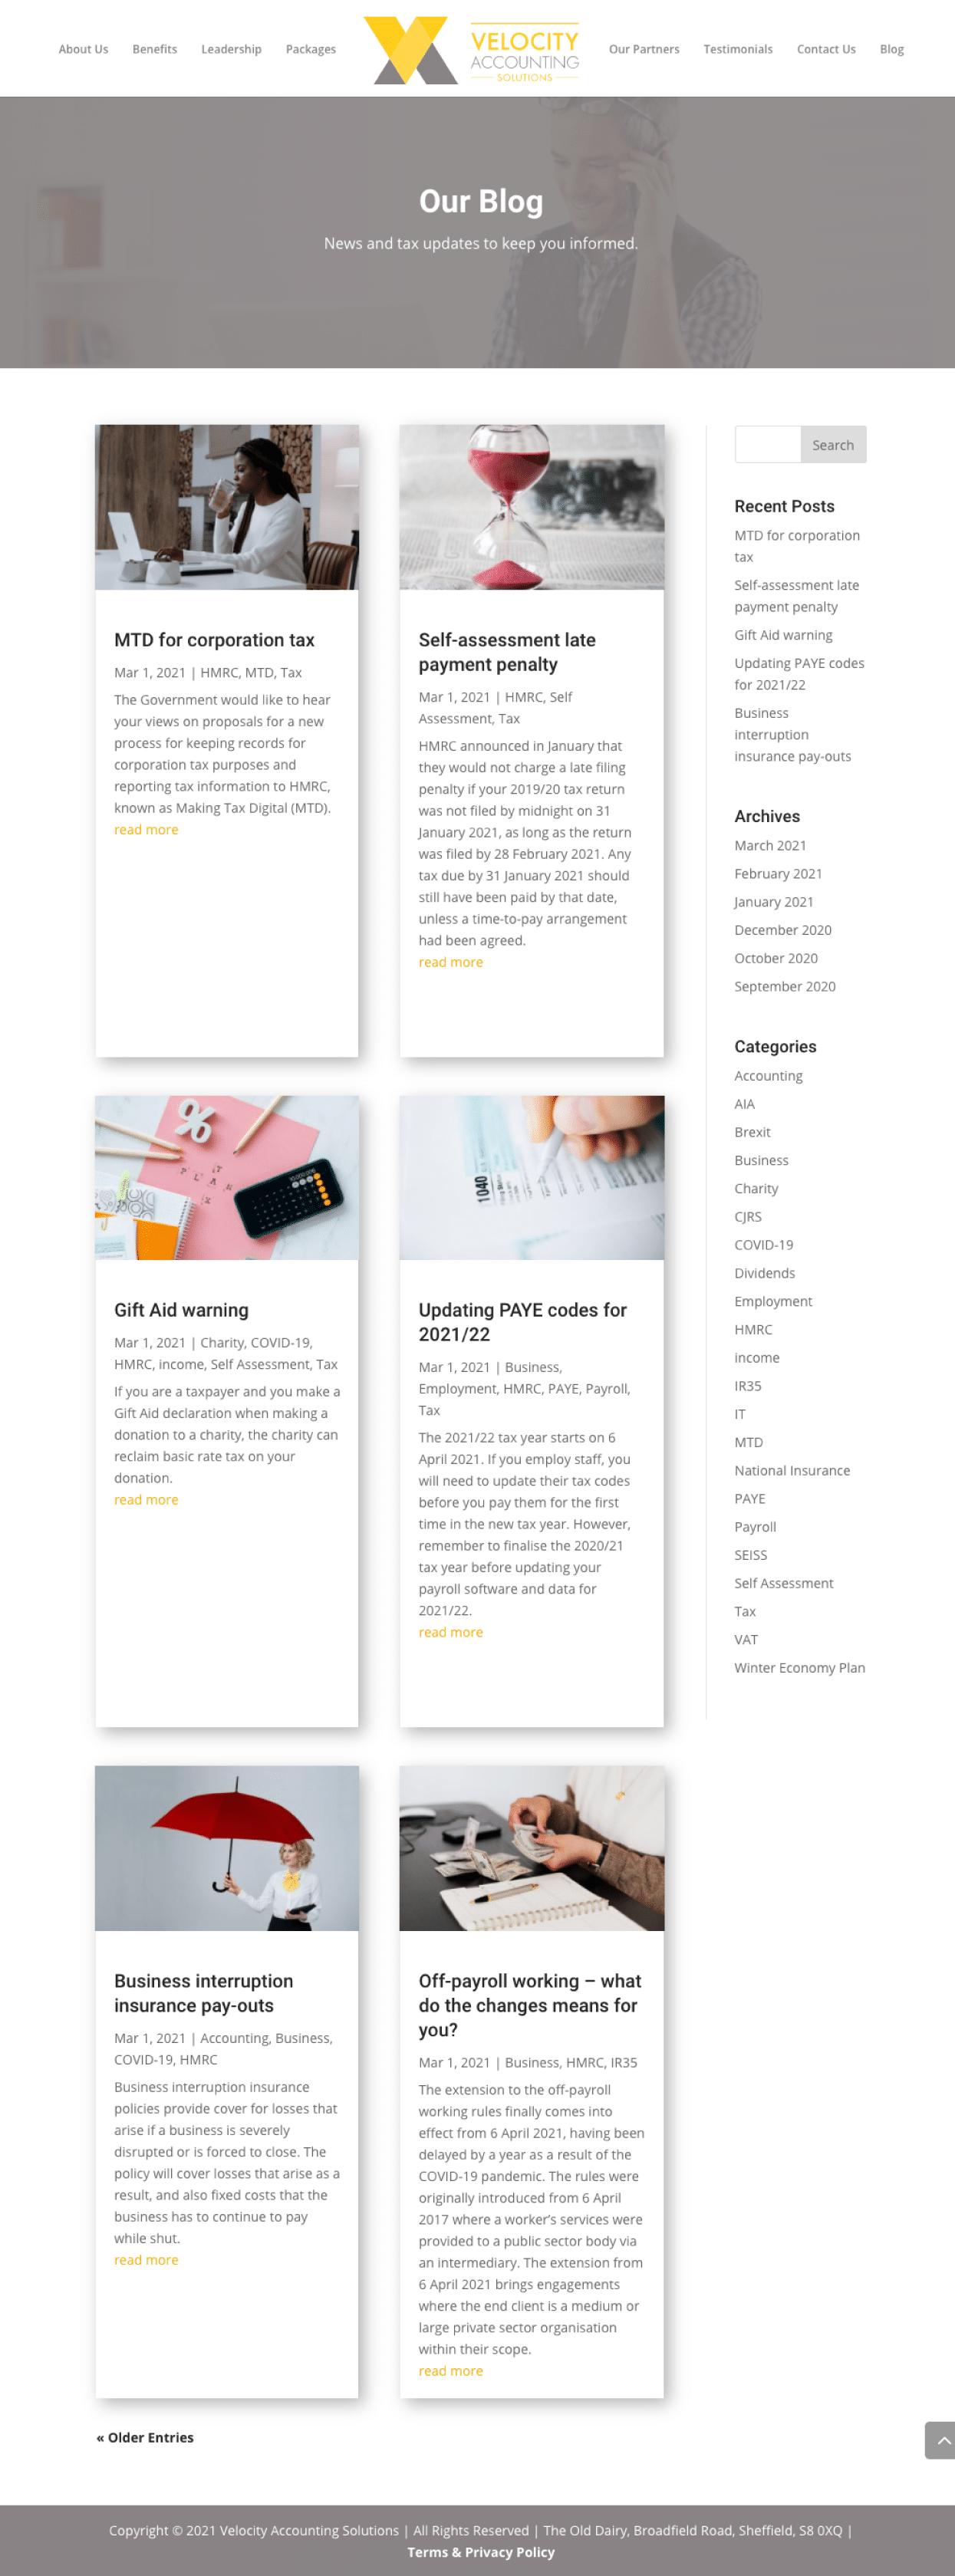 velocity-blog-page-layout